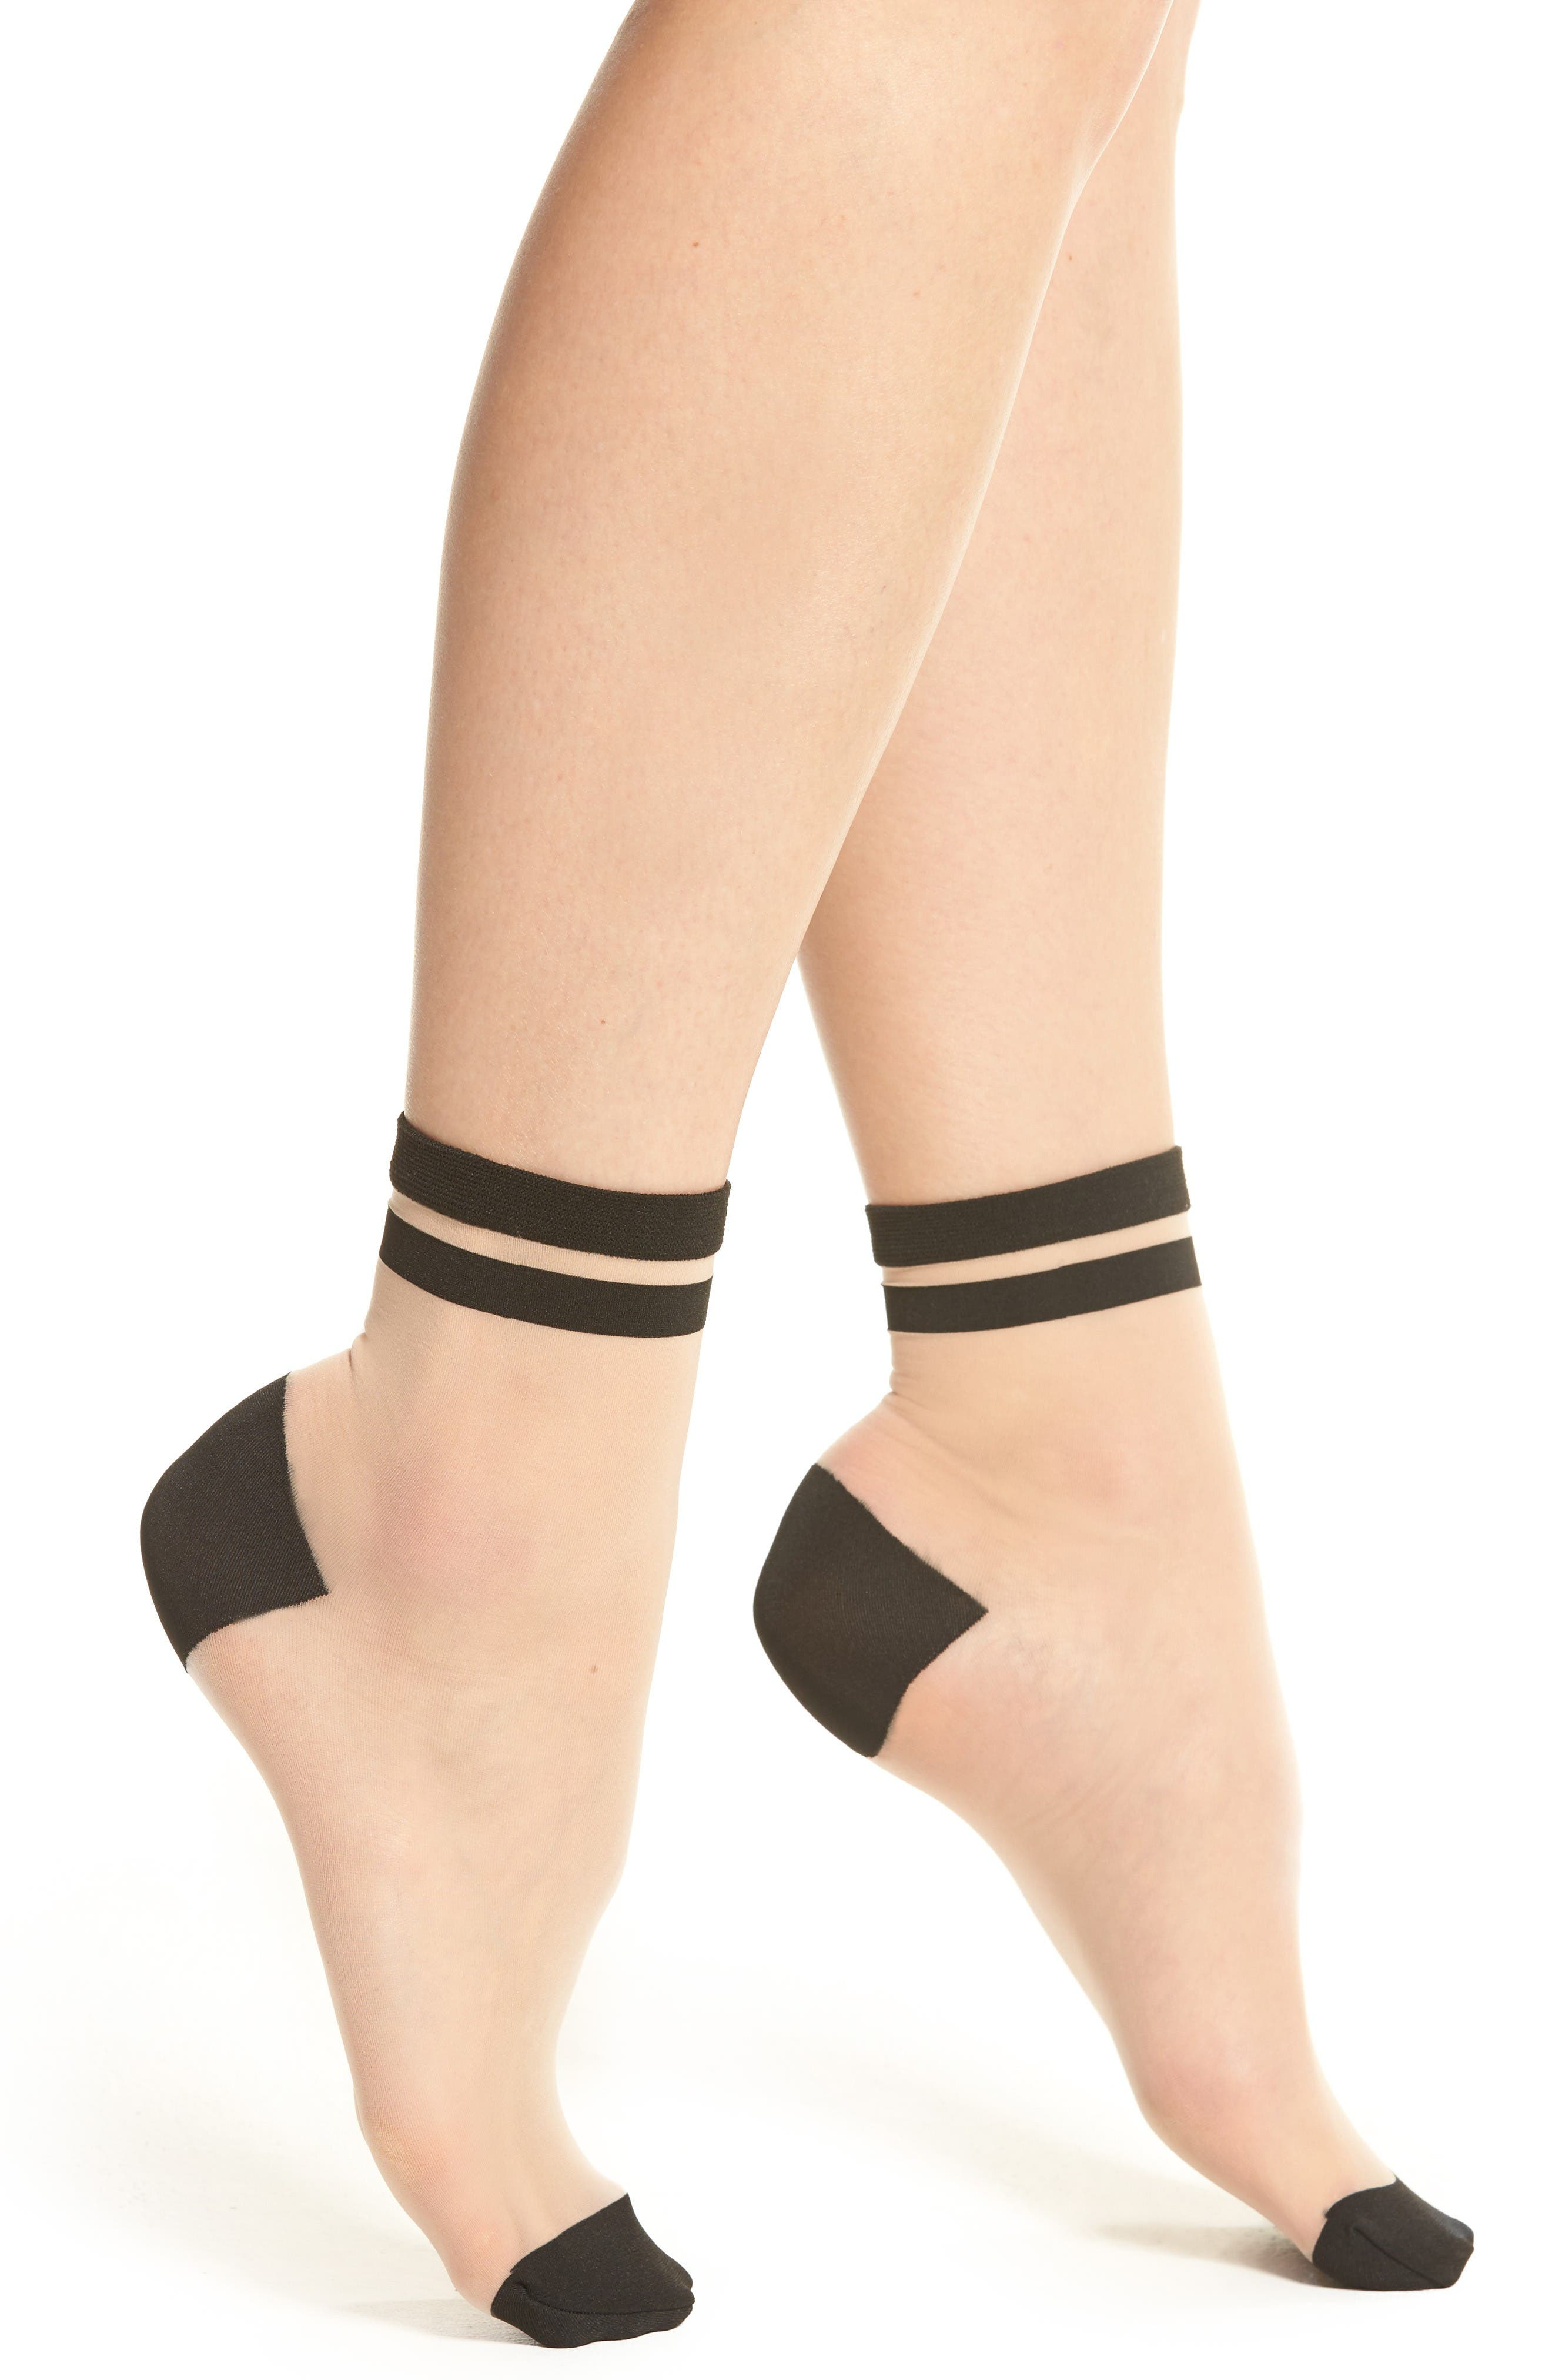 Alternate Image 1 Selected - DKNY 2-Pack Sheer Ankle Socks